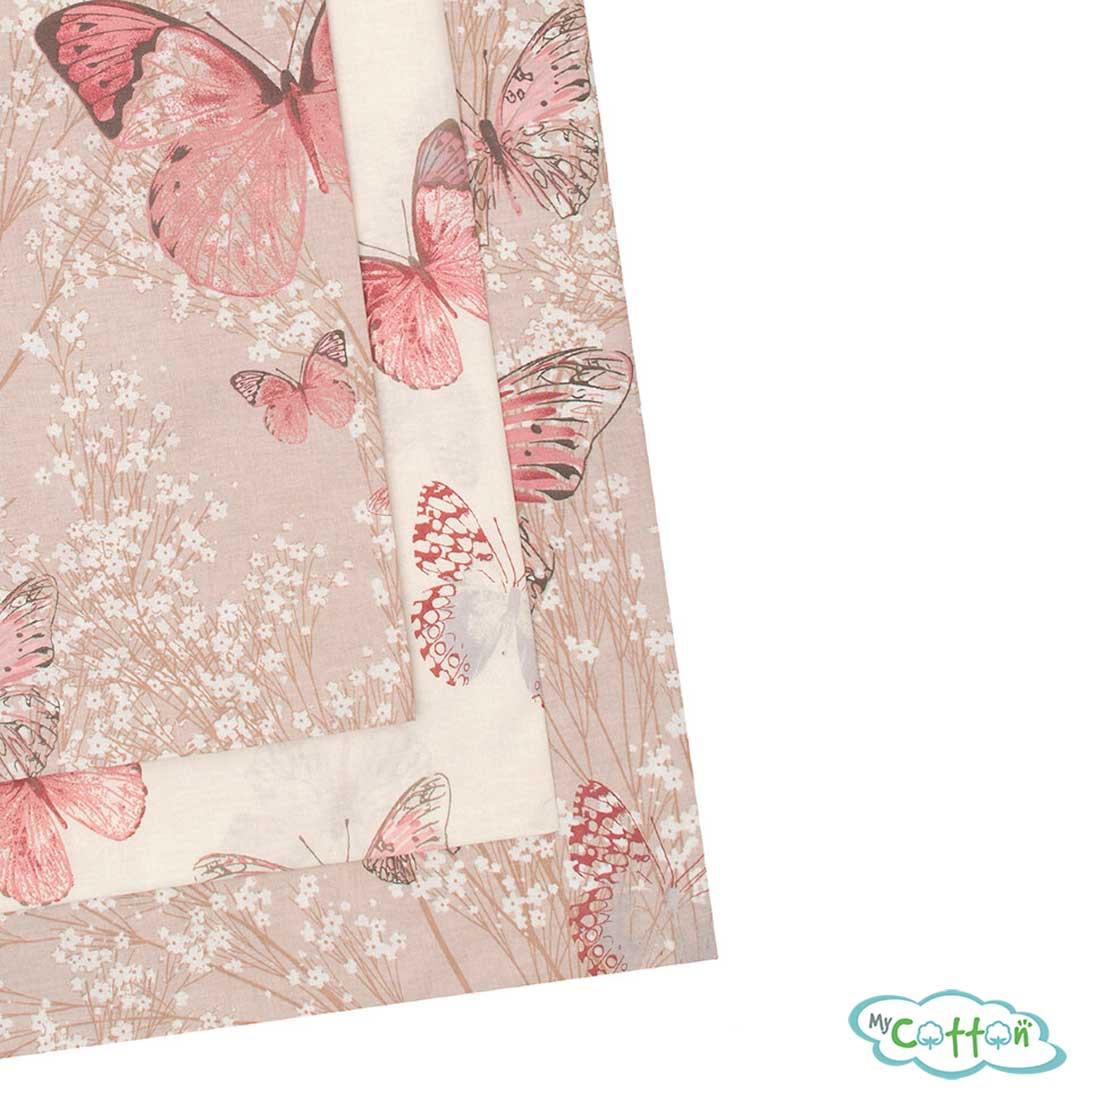 Постельное белье Butterflyколлекция Marilyn Monroe2